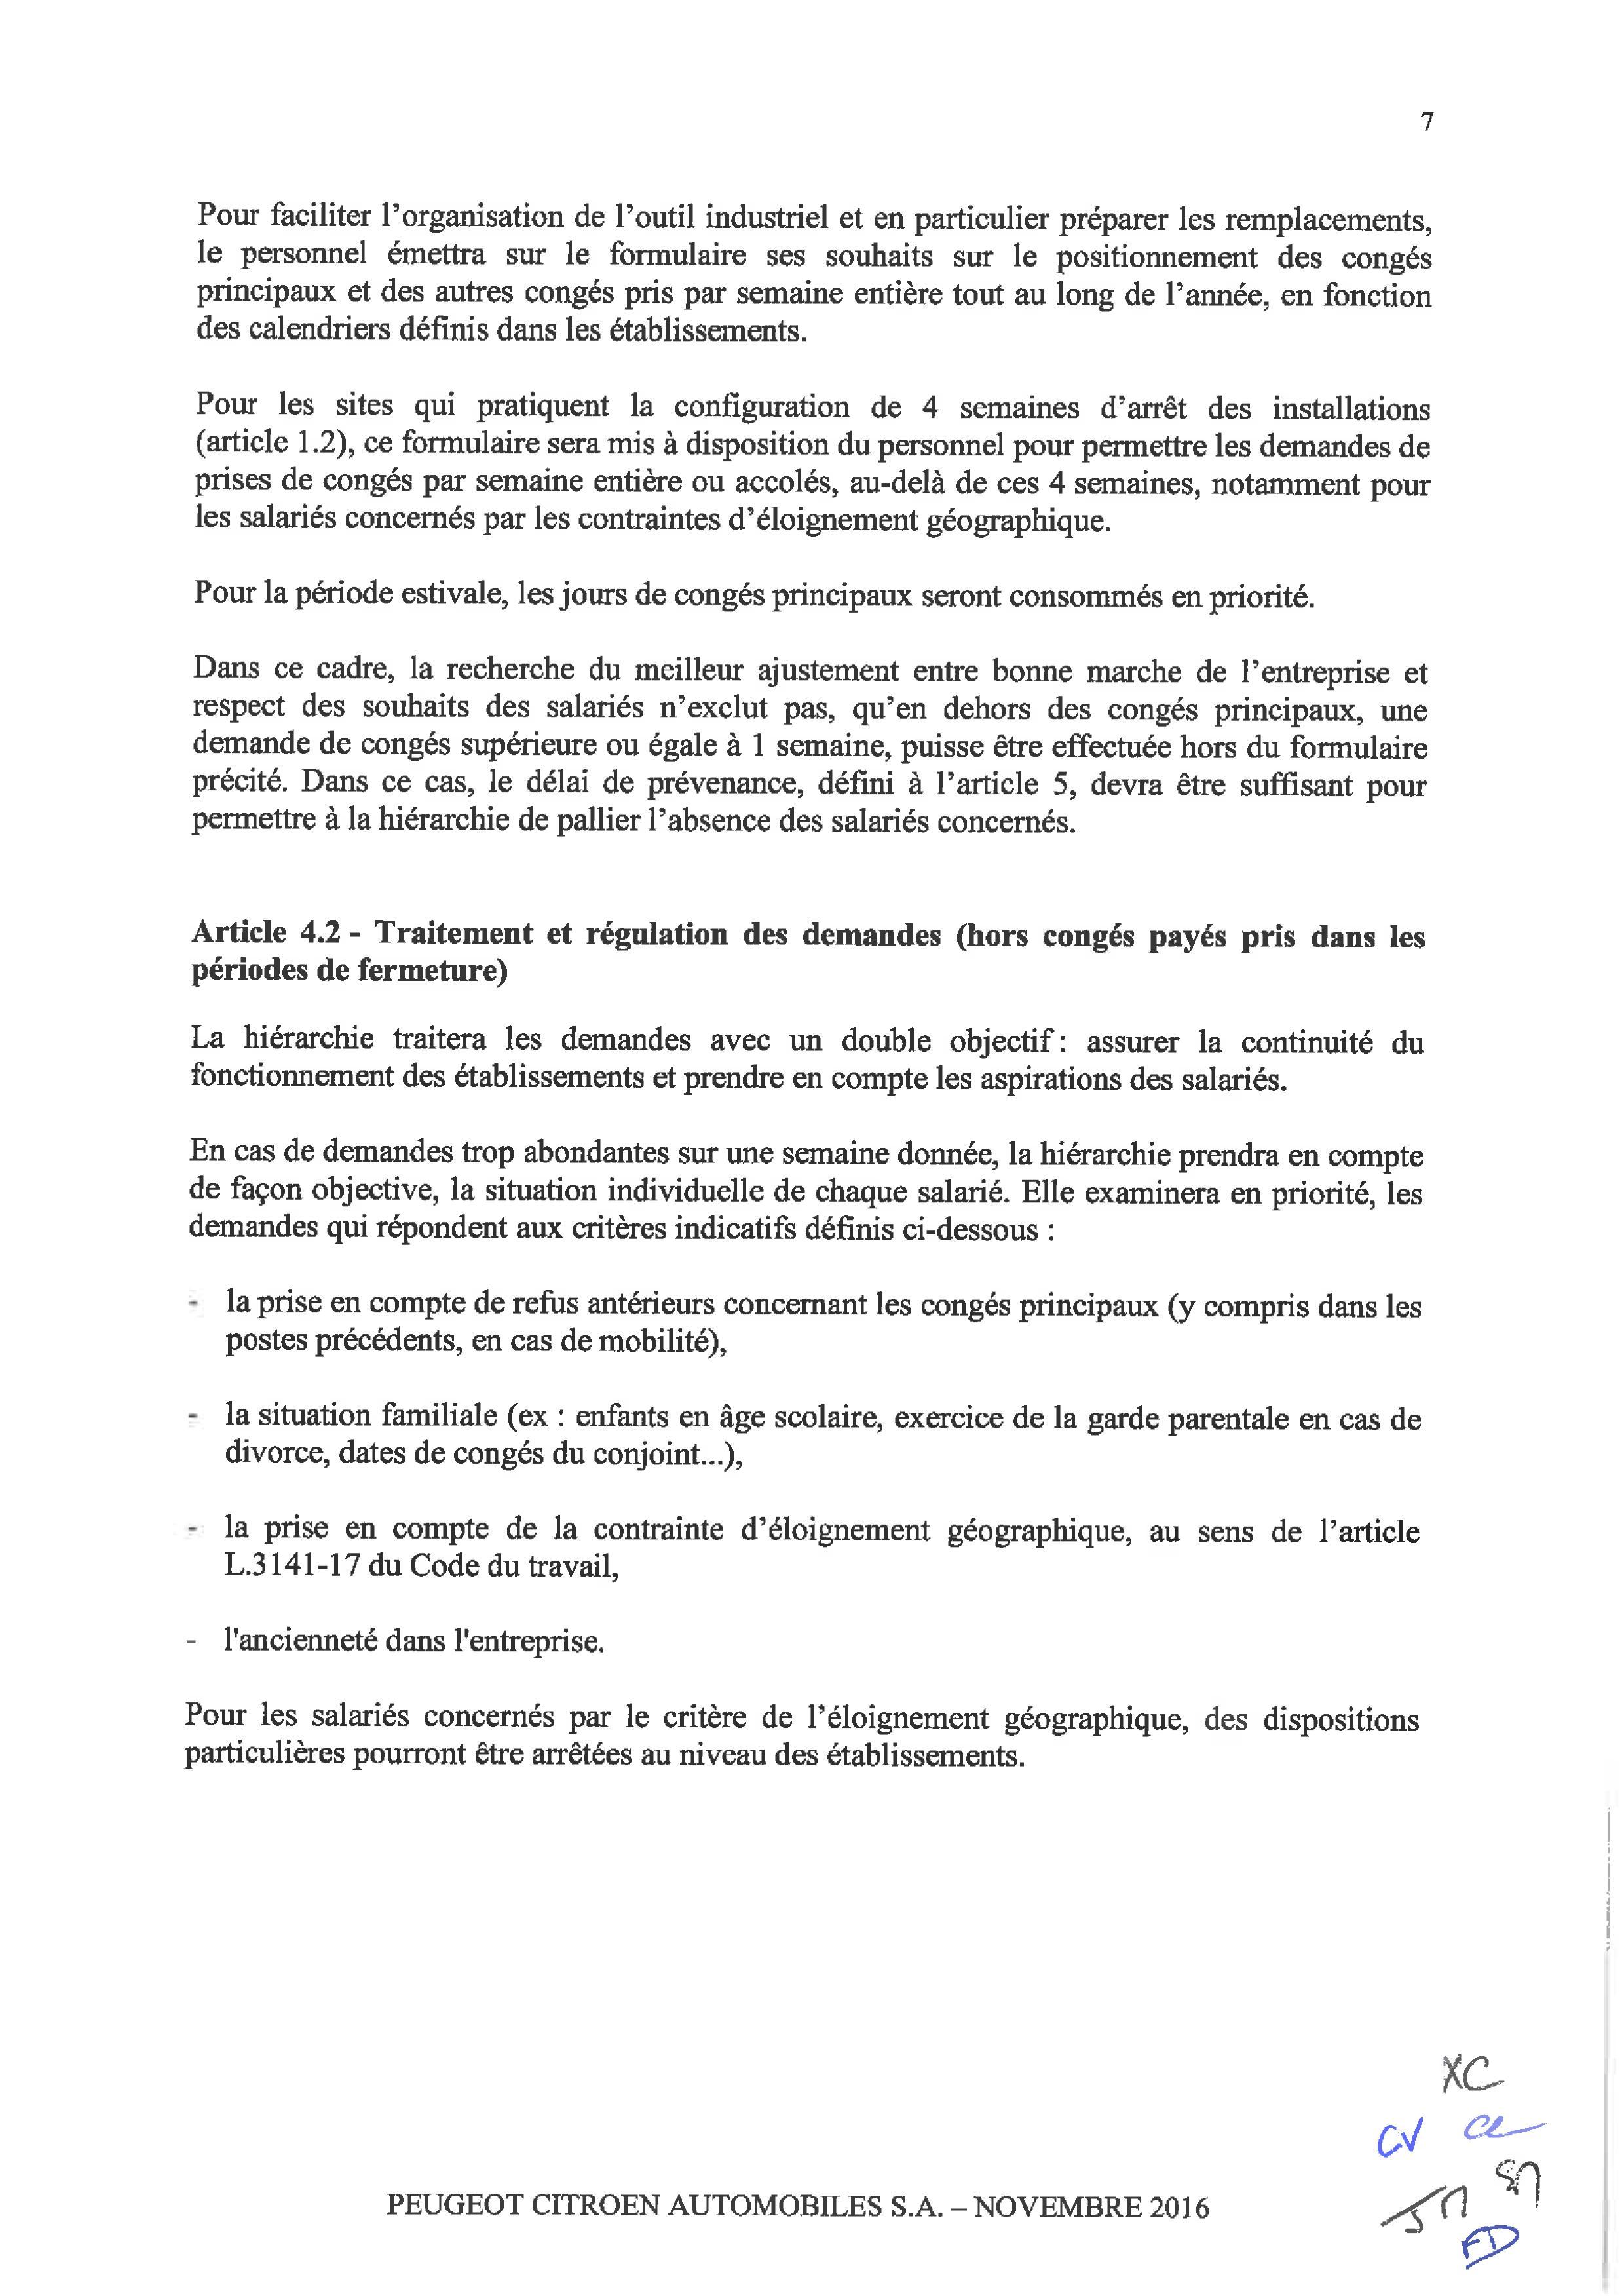 Accord centrale TT Congés_06